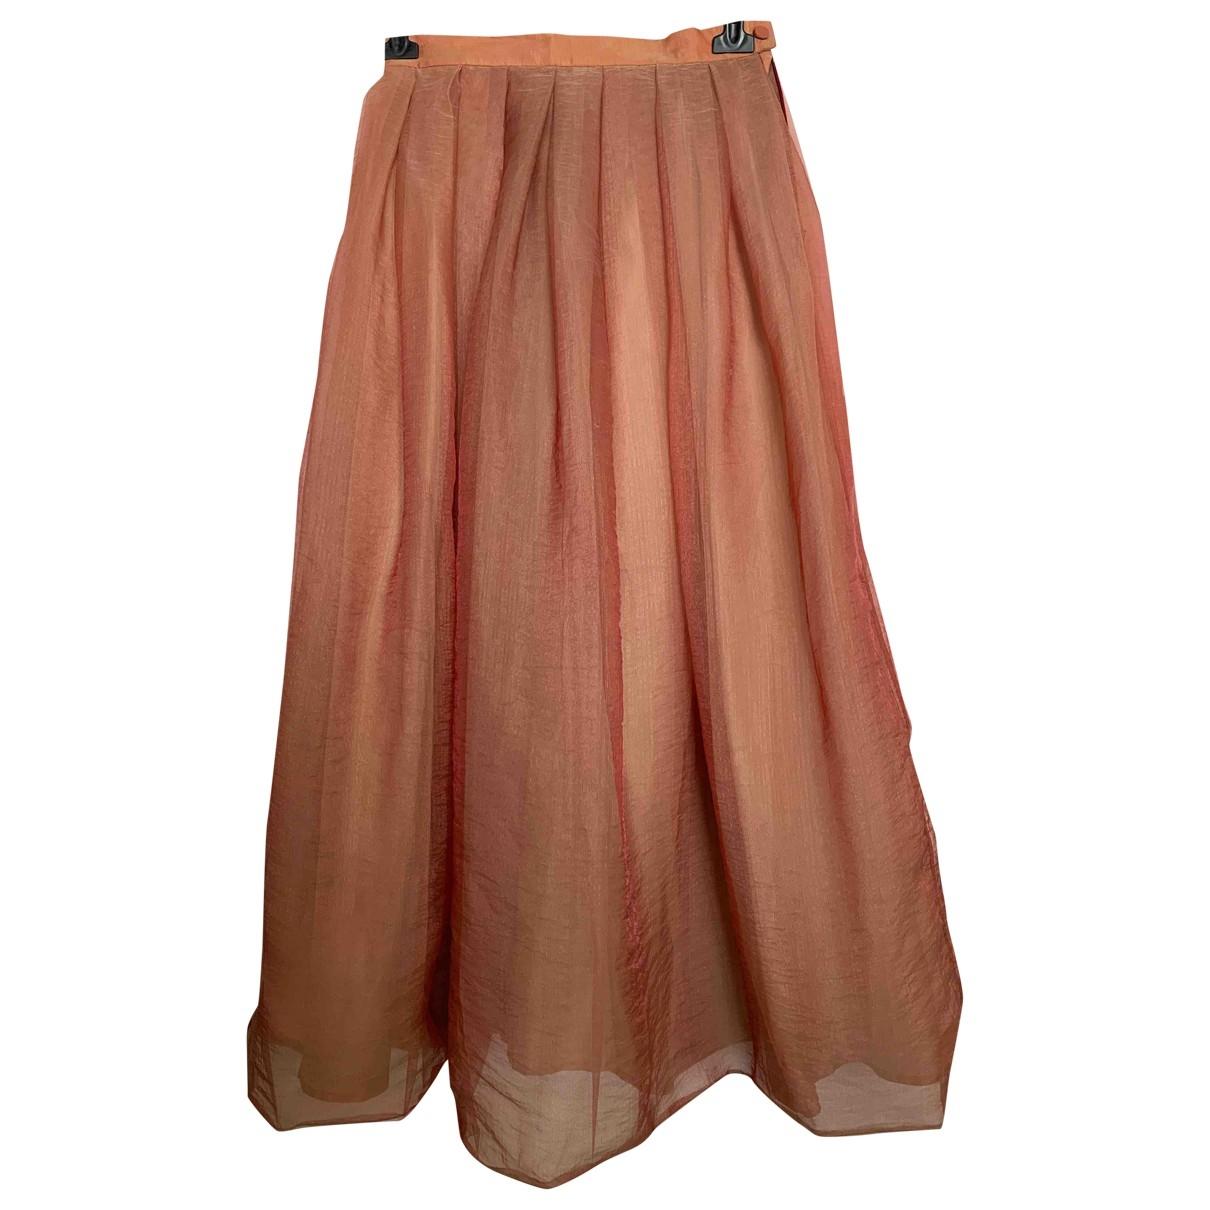 Emporio Armani \N skirt for Women 44 IT